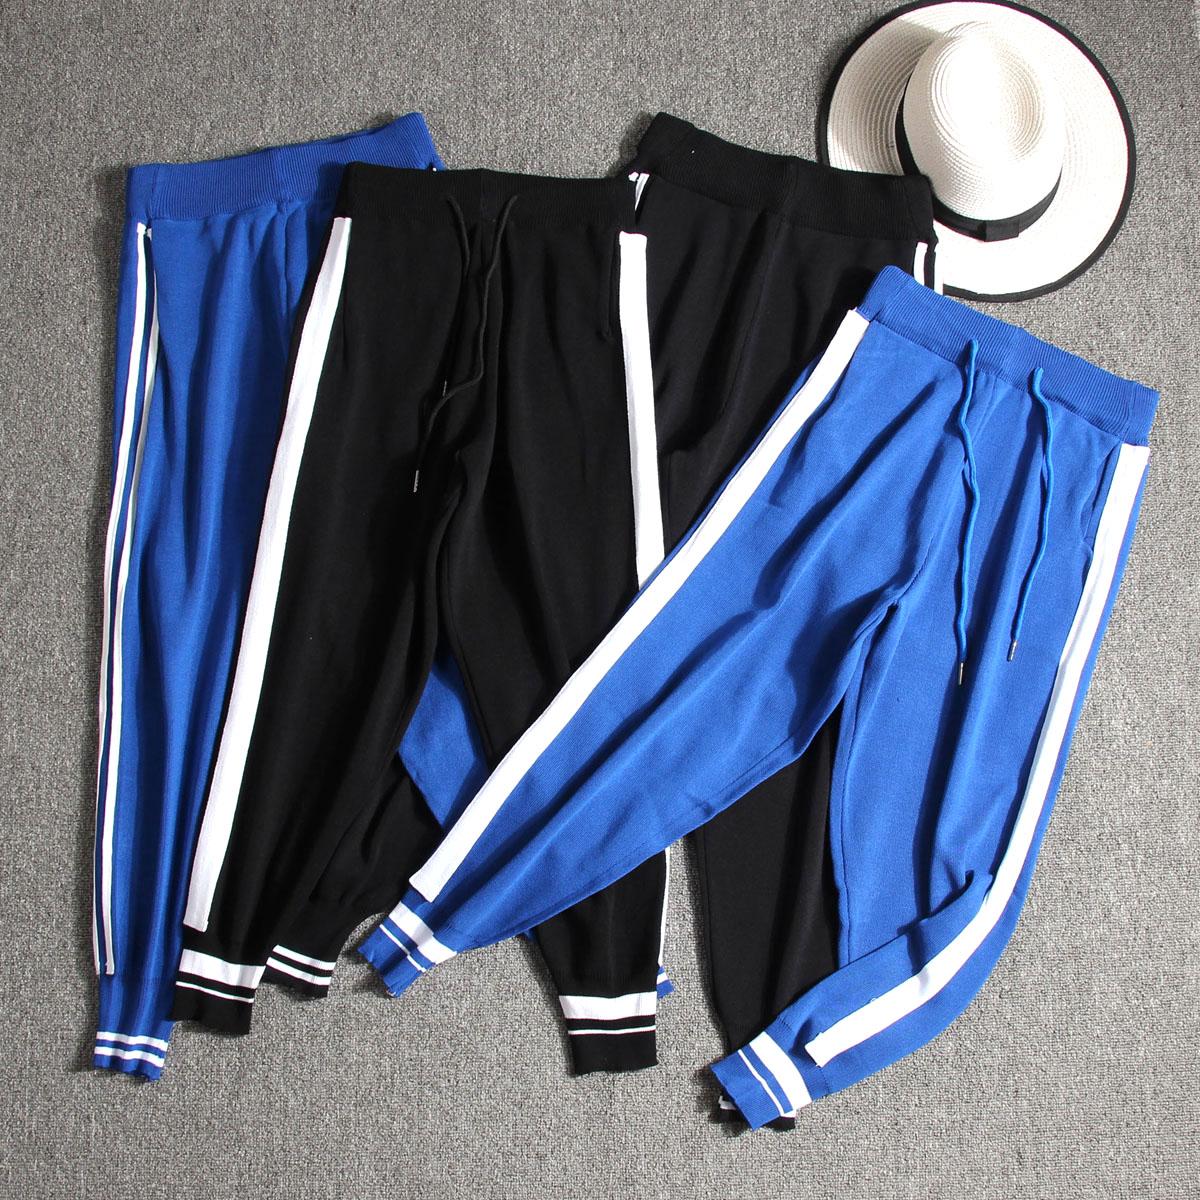 Automne porter super-feu mince tricot neuf cent pantalon serré taille casual étudiant pantalon Harlan pantalon sport pantalon